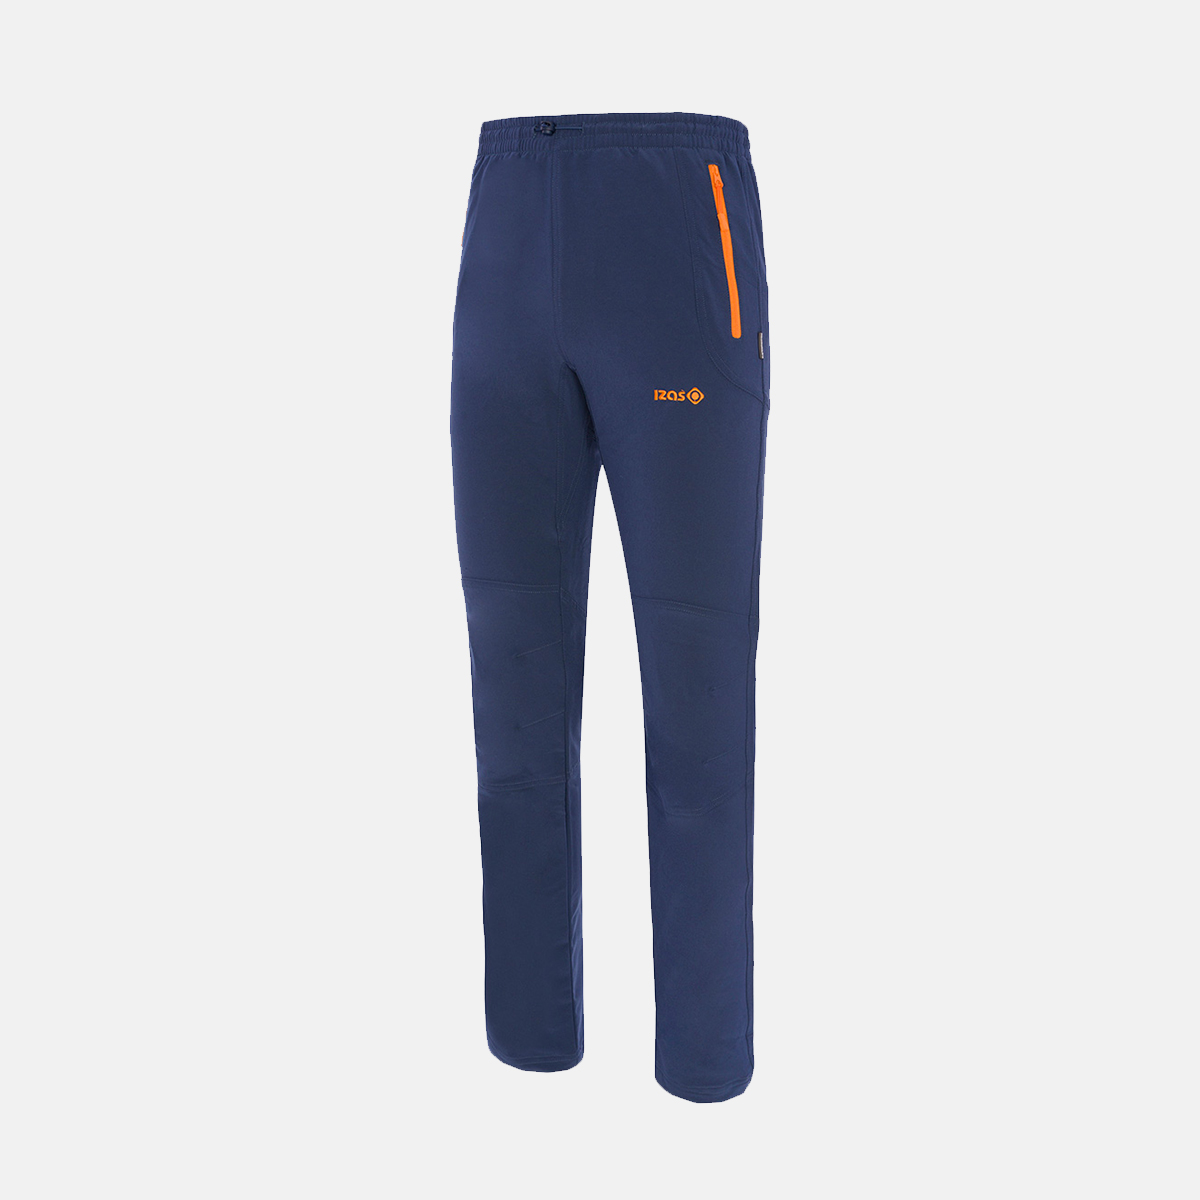 MAN'S CLOISTER MOUNT STRETCH PANT BLUE